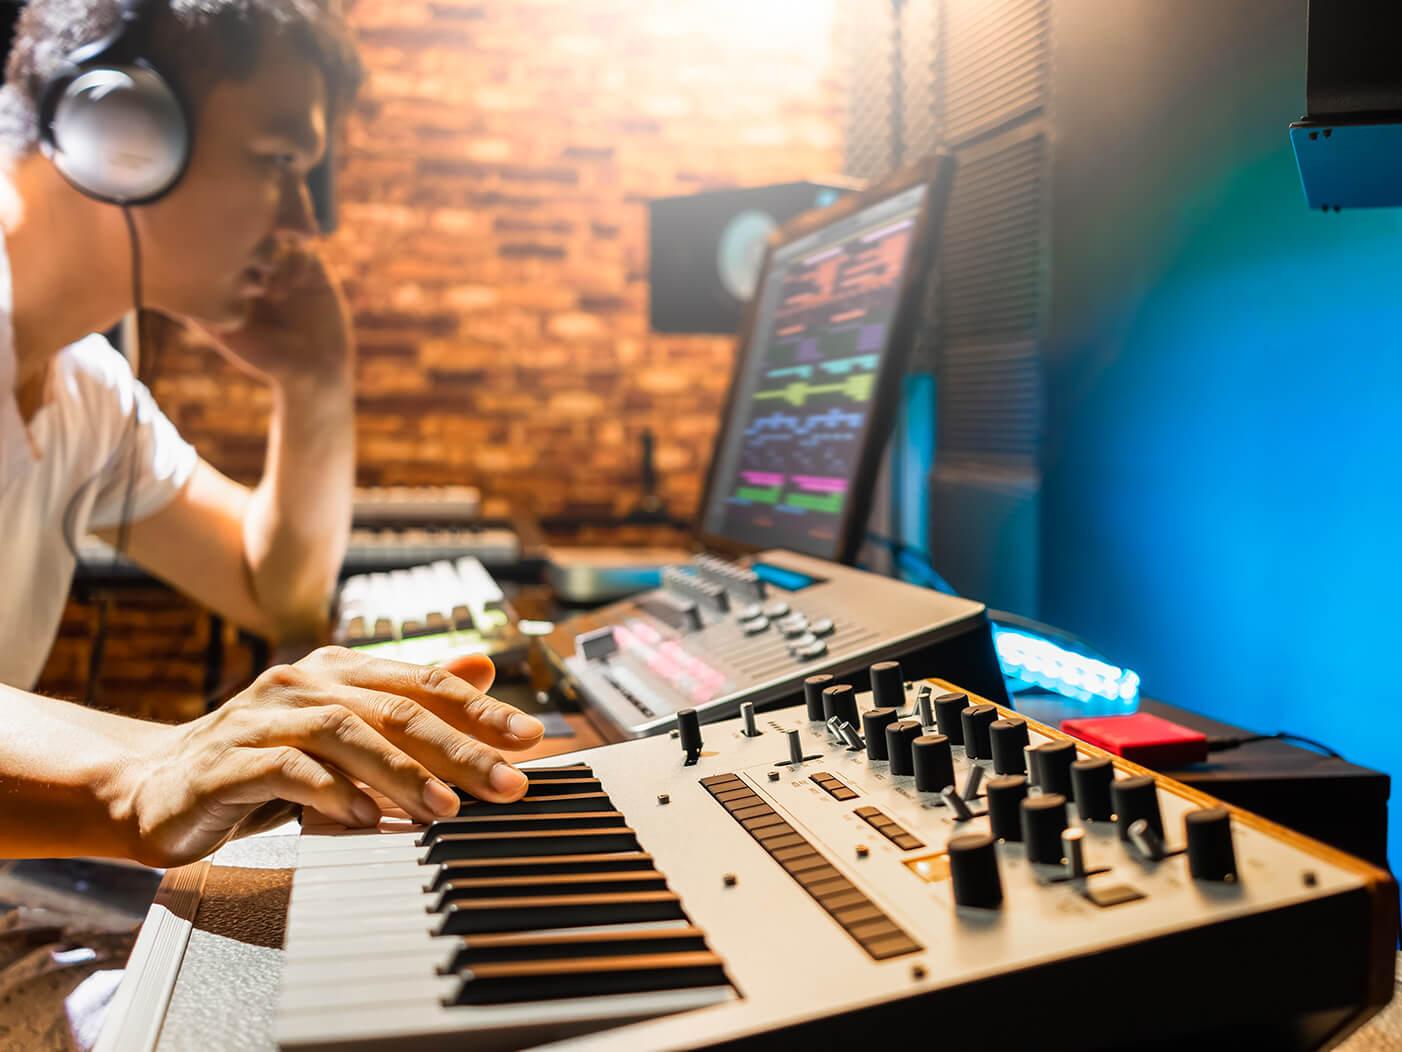 analogue synthesizer player